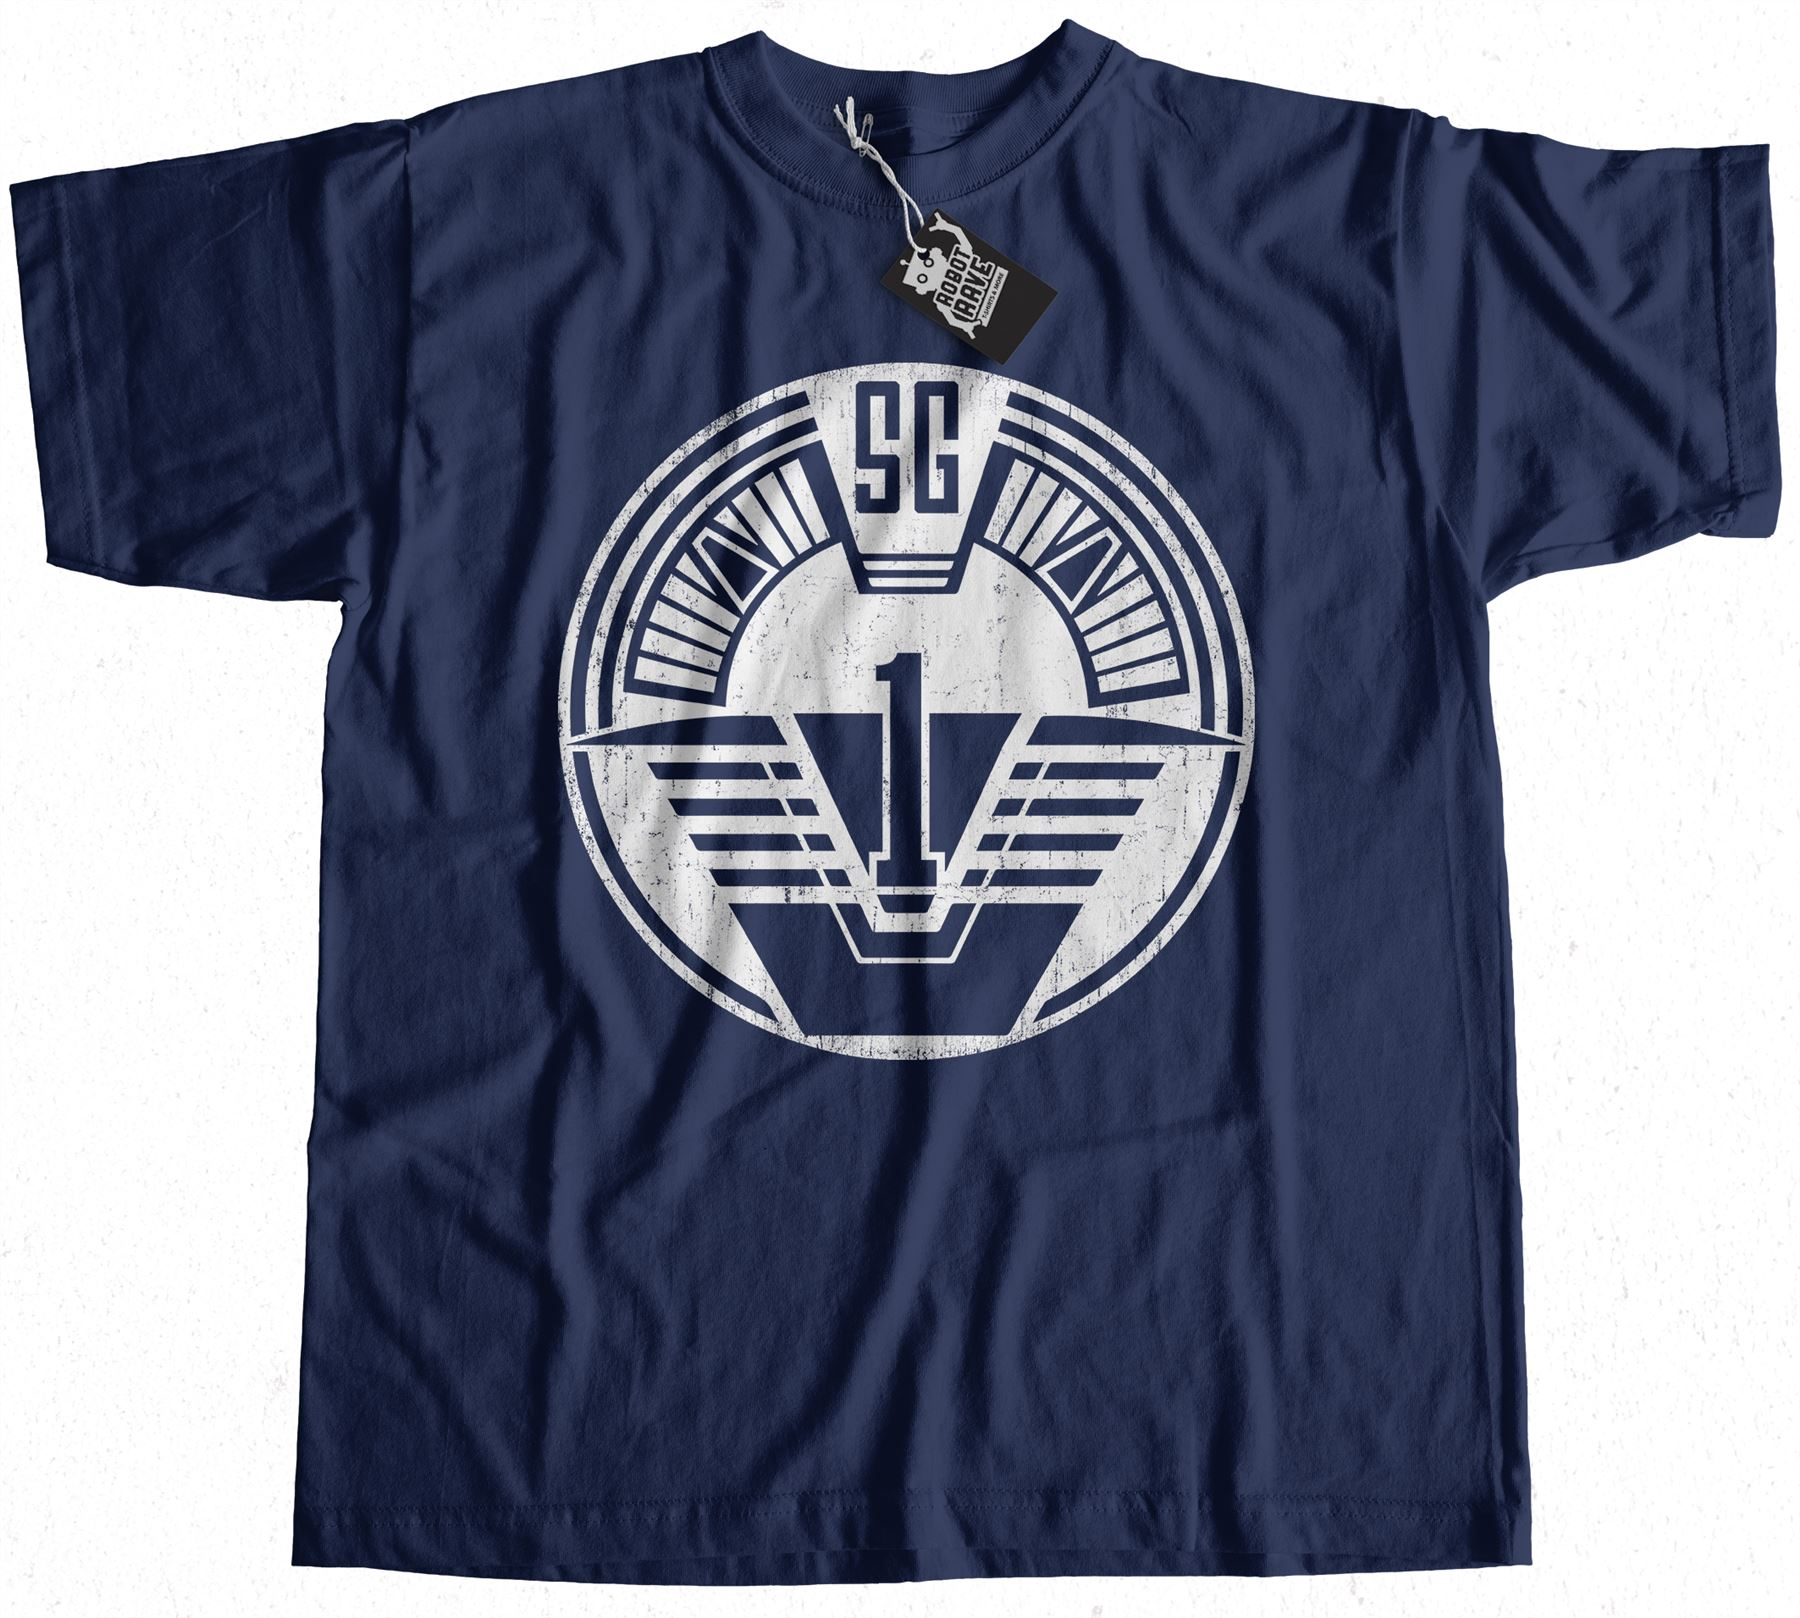 SG1-T-Shirt-100-Premium-Cotton Indexbild 16